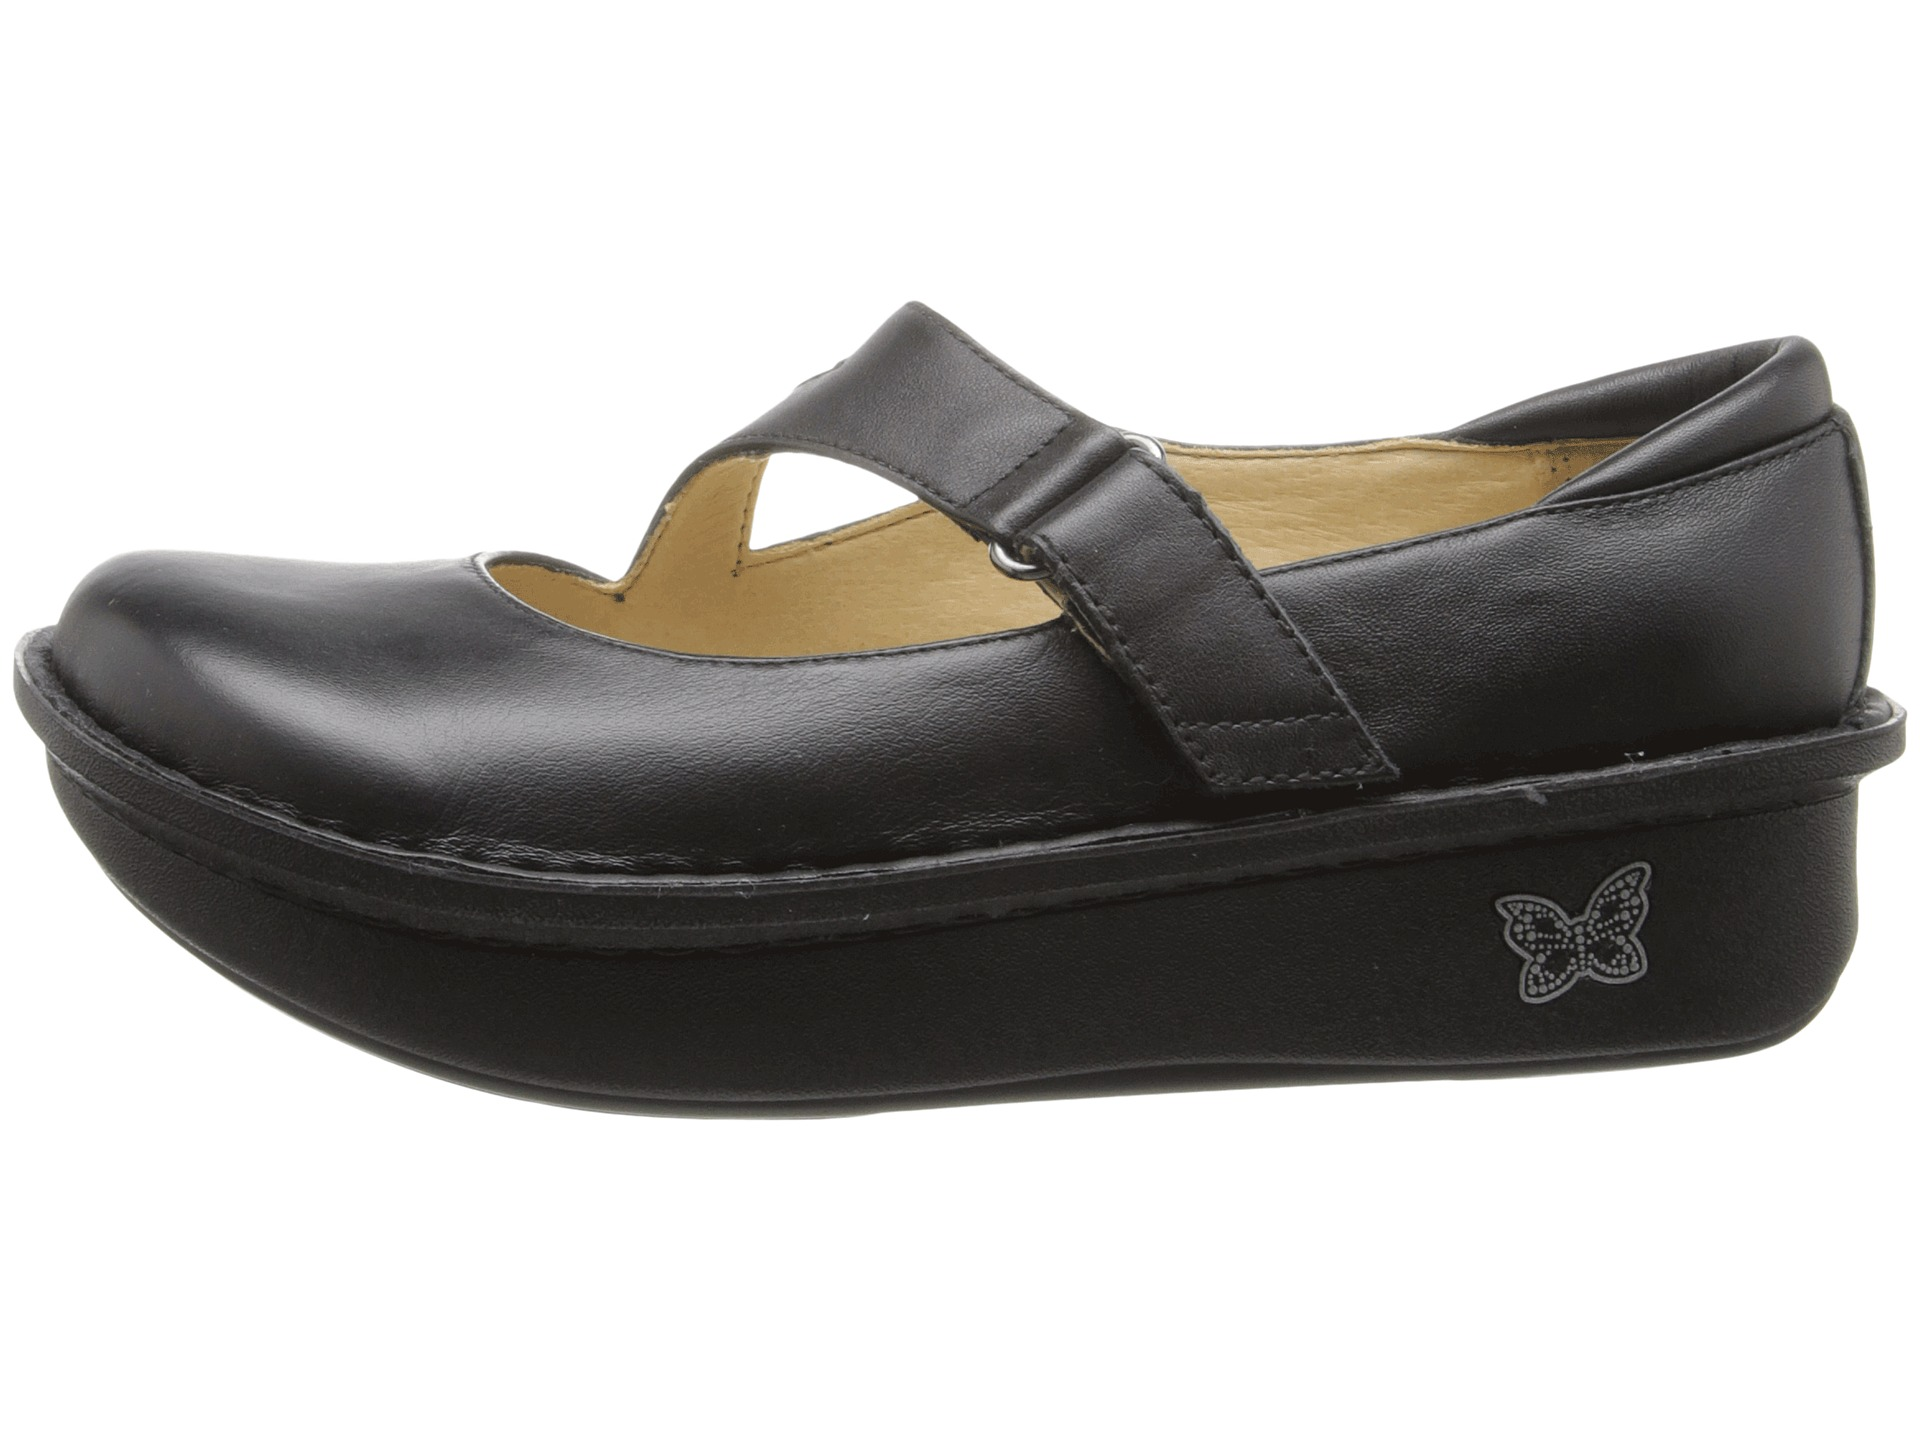 Alegria Shoes Sale Zappos